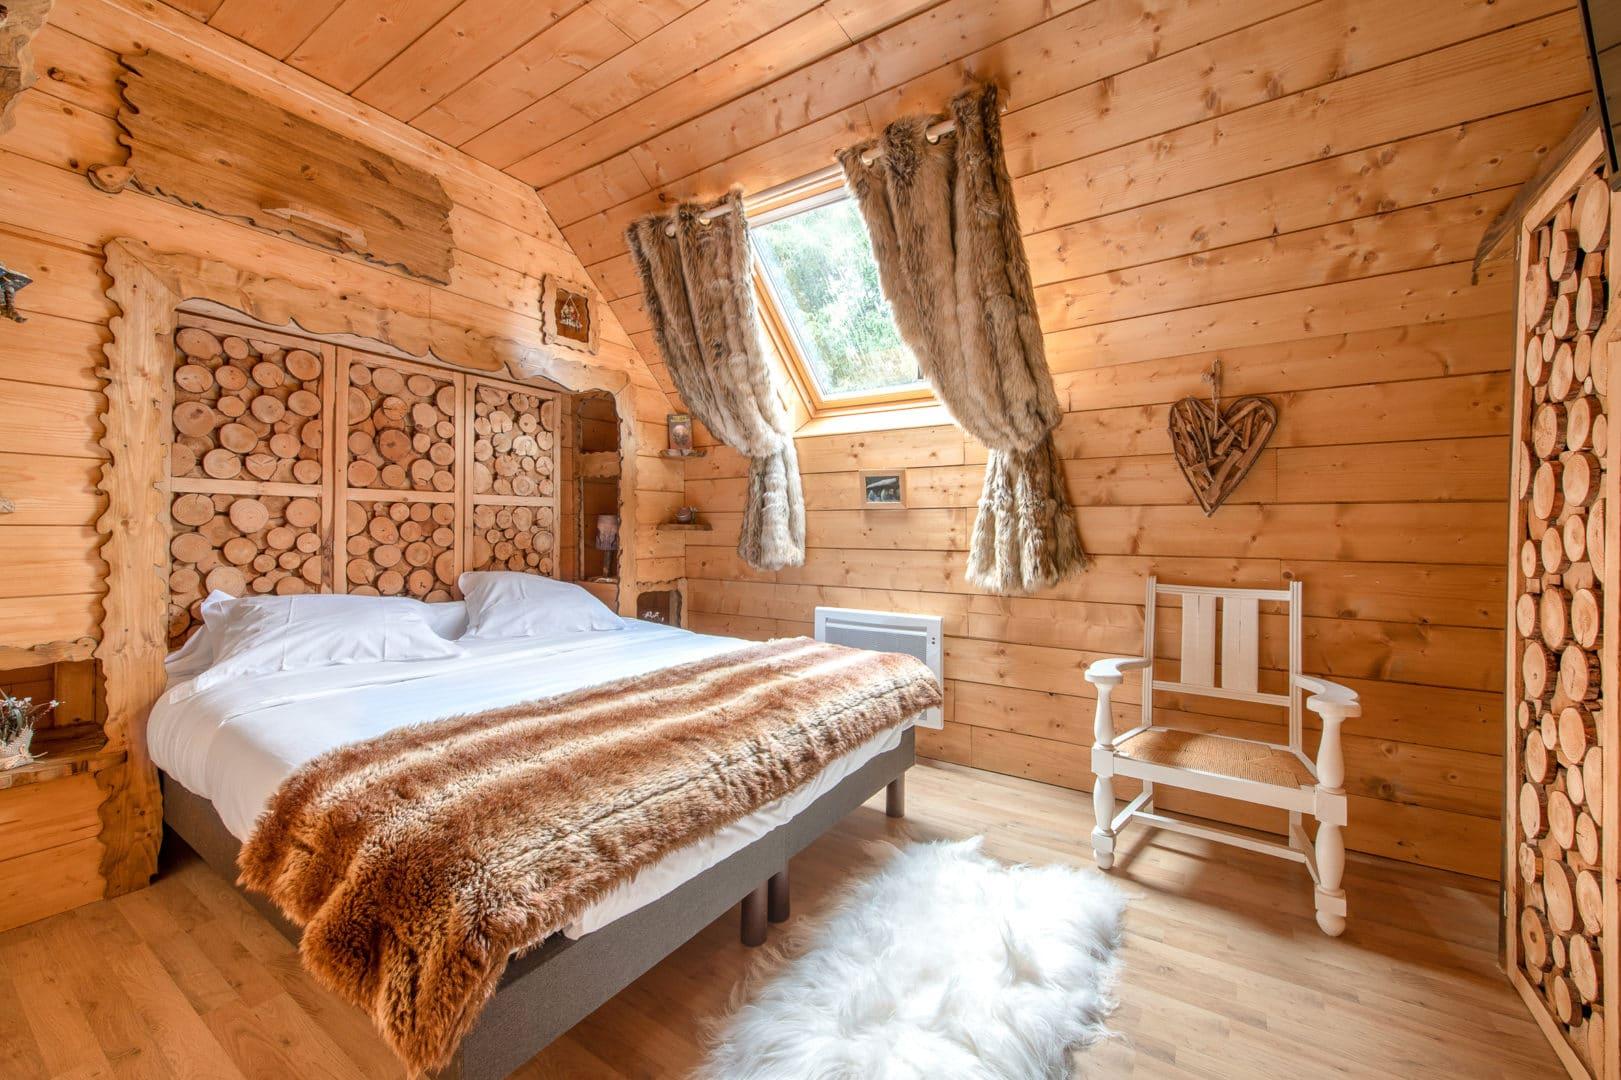 10 chambre les korrigans - Accueil